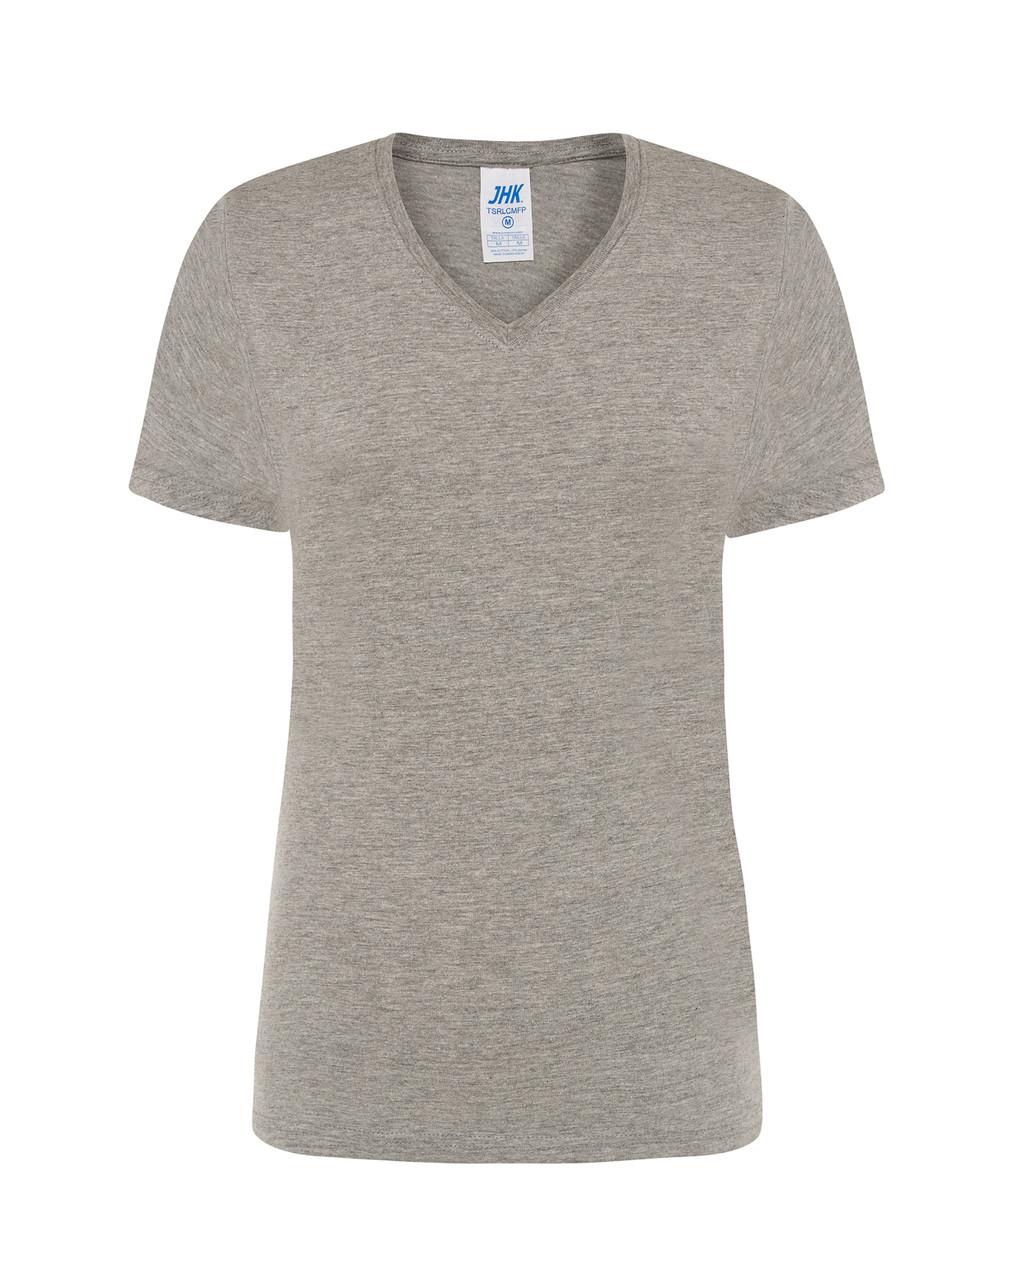 Женская футболка JHK COMFORT V-NECK LADY цвет темно-серый меланж (GM)